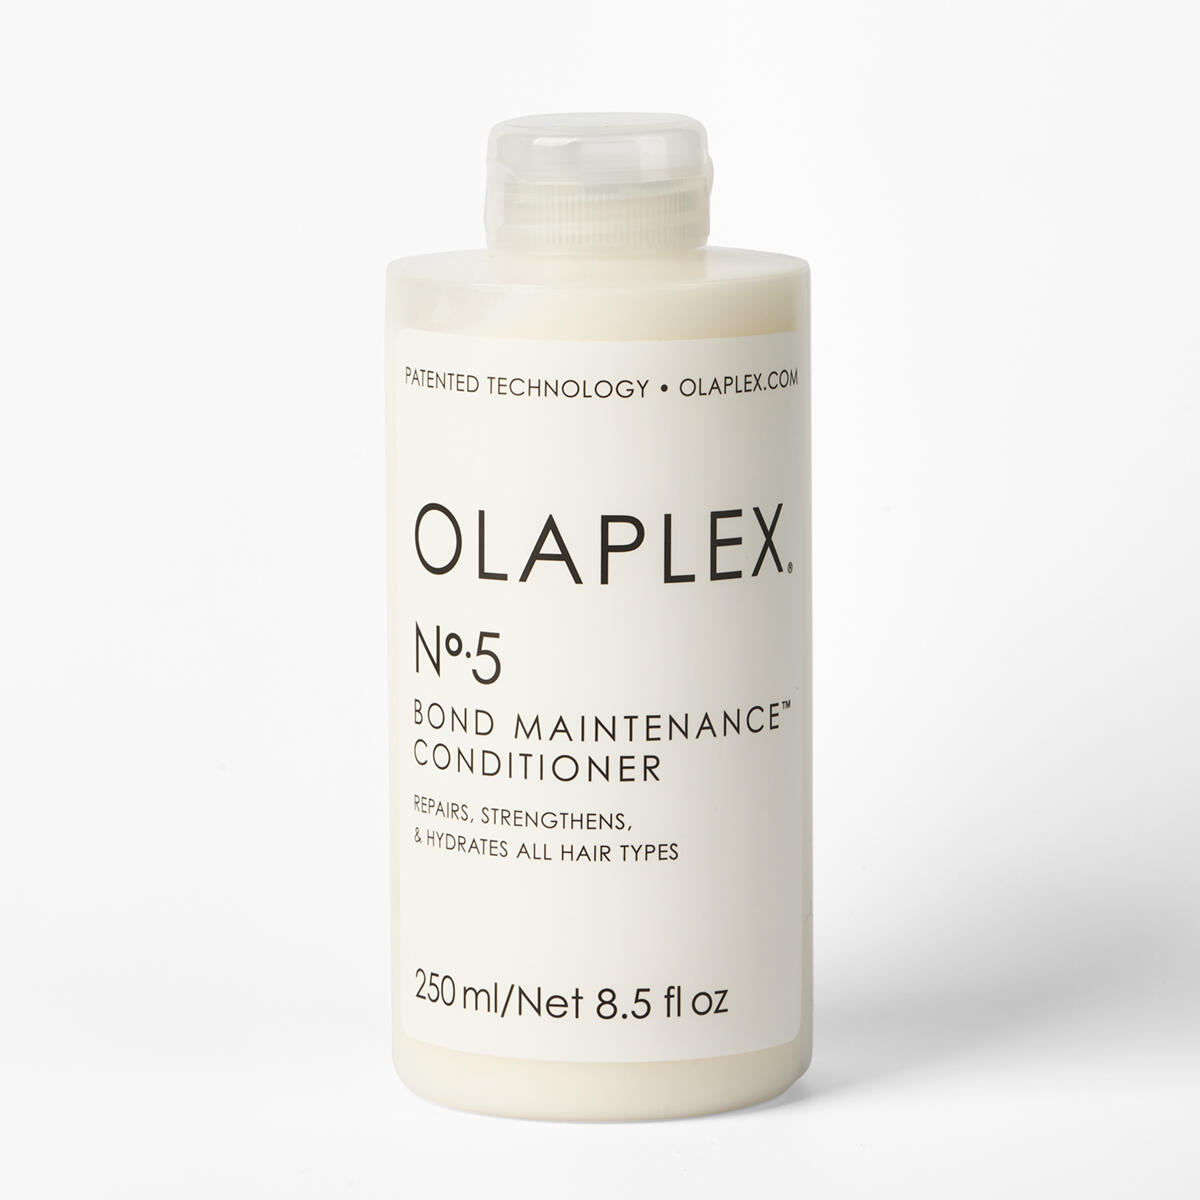 Olaplex Bond Maintenance Conditioner No. 5